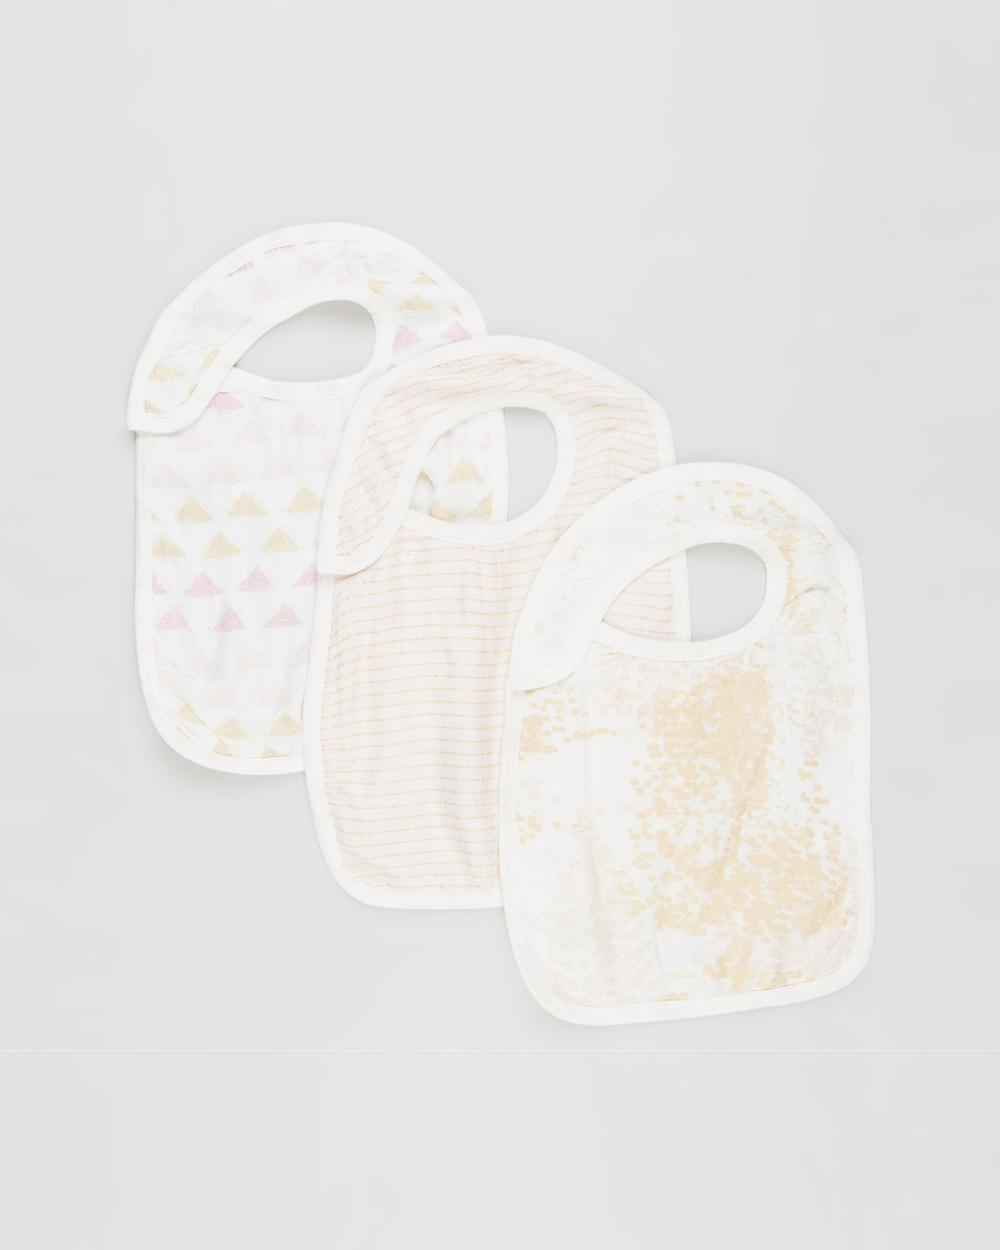 Aden & Anais Silky Soft 3 Pack Snap Bibs Metallic Primrose 3-Pack